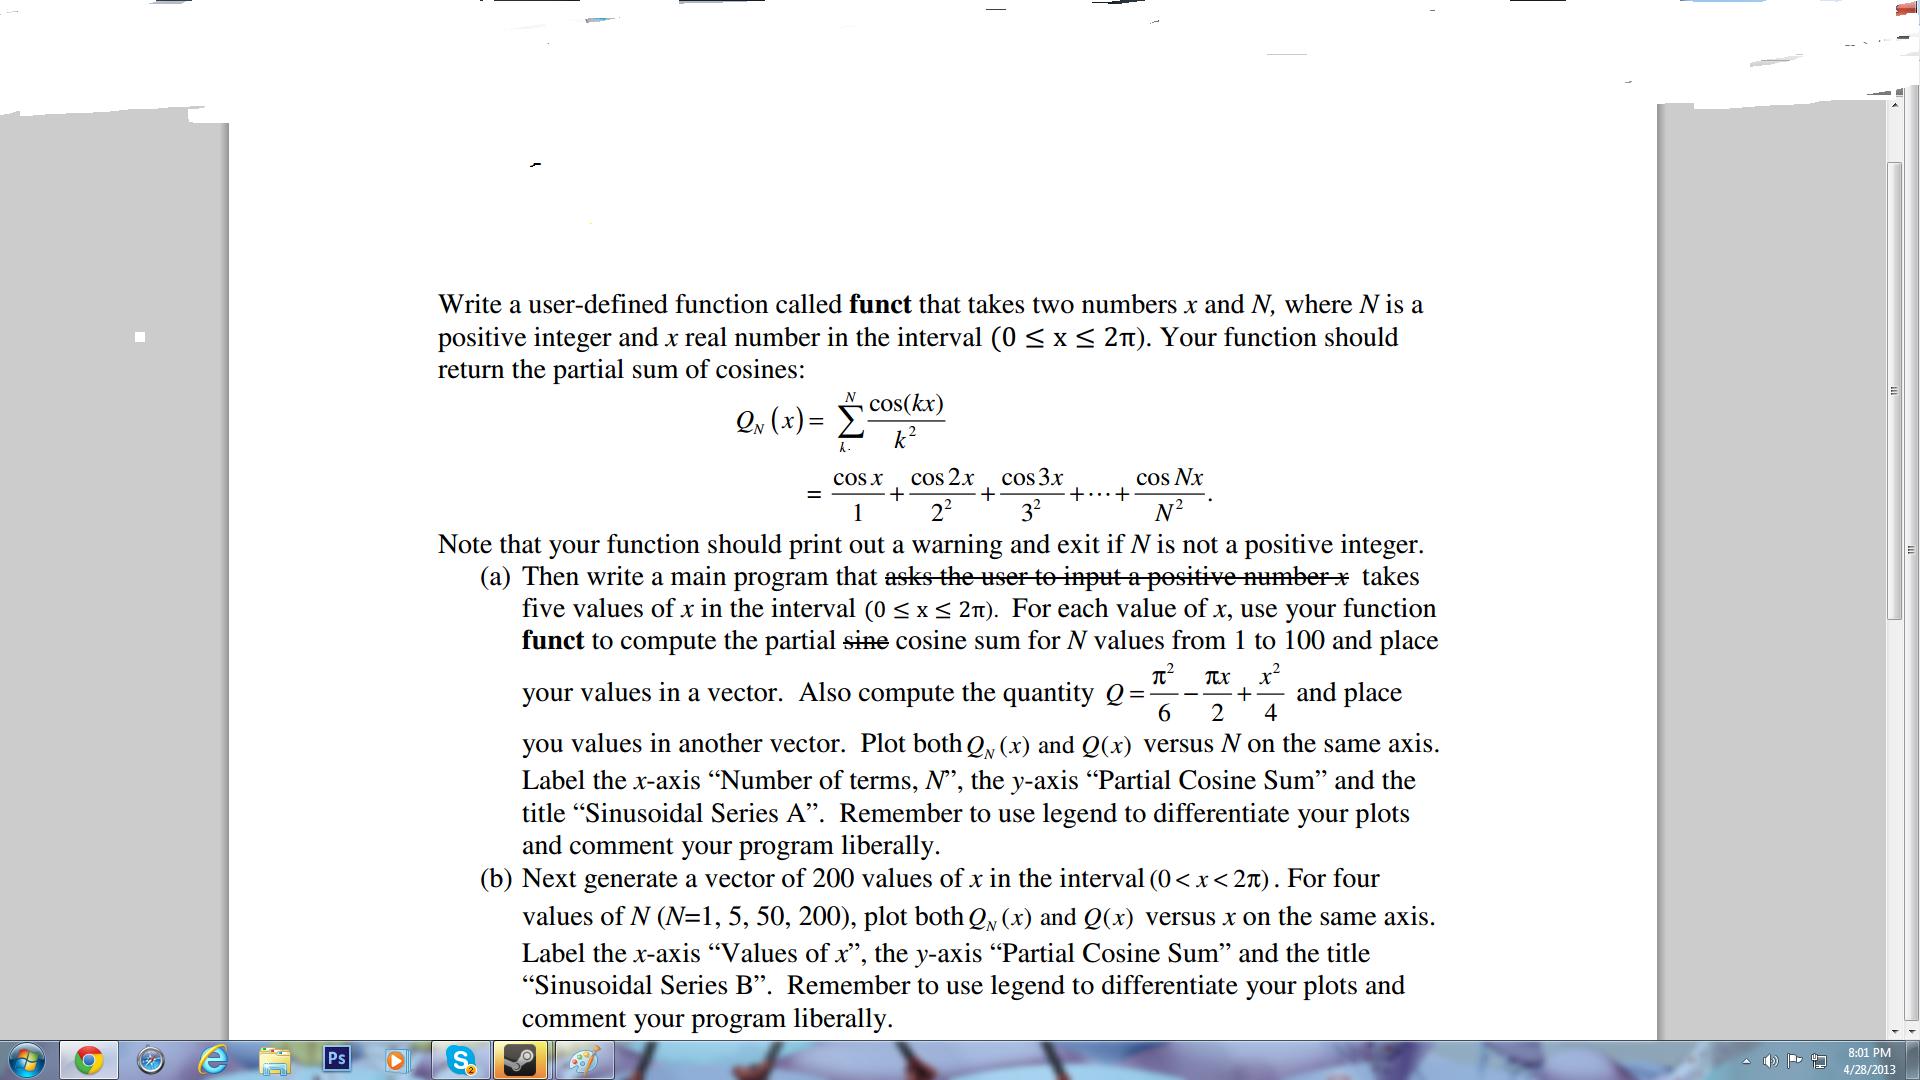 media/c0c/c0c0574e-a6b6-4f7e-bee1-67